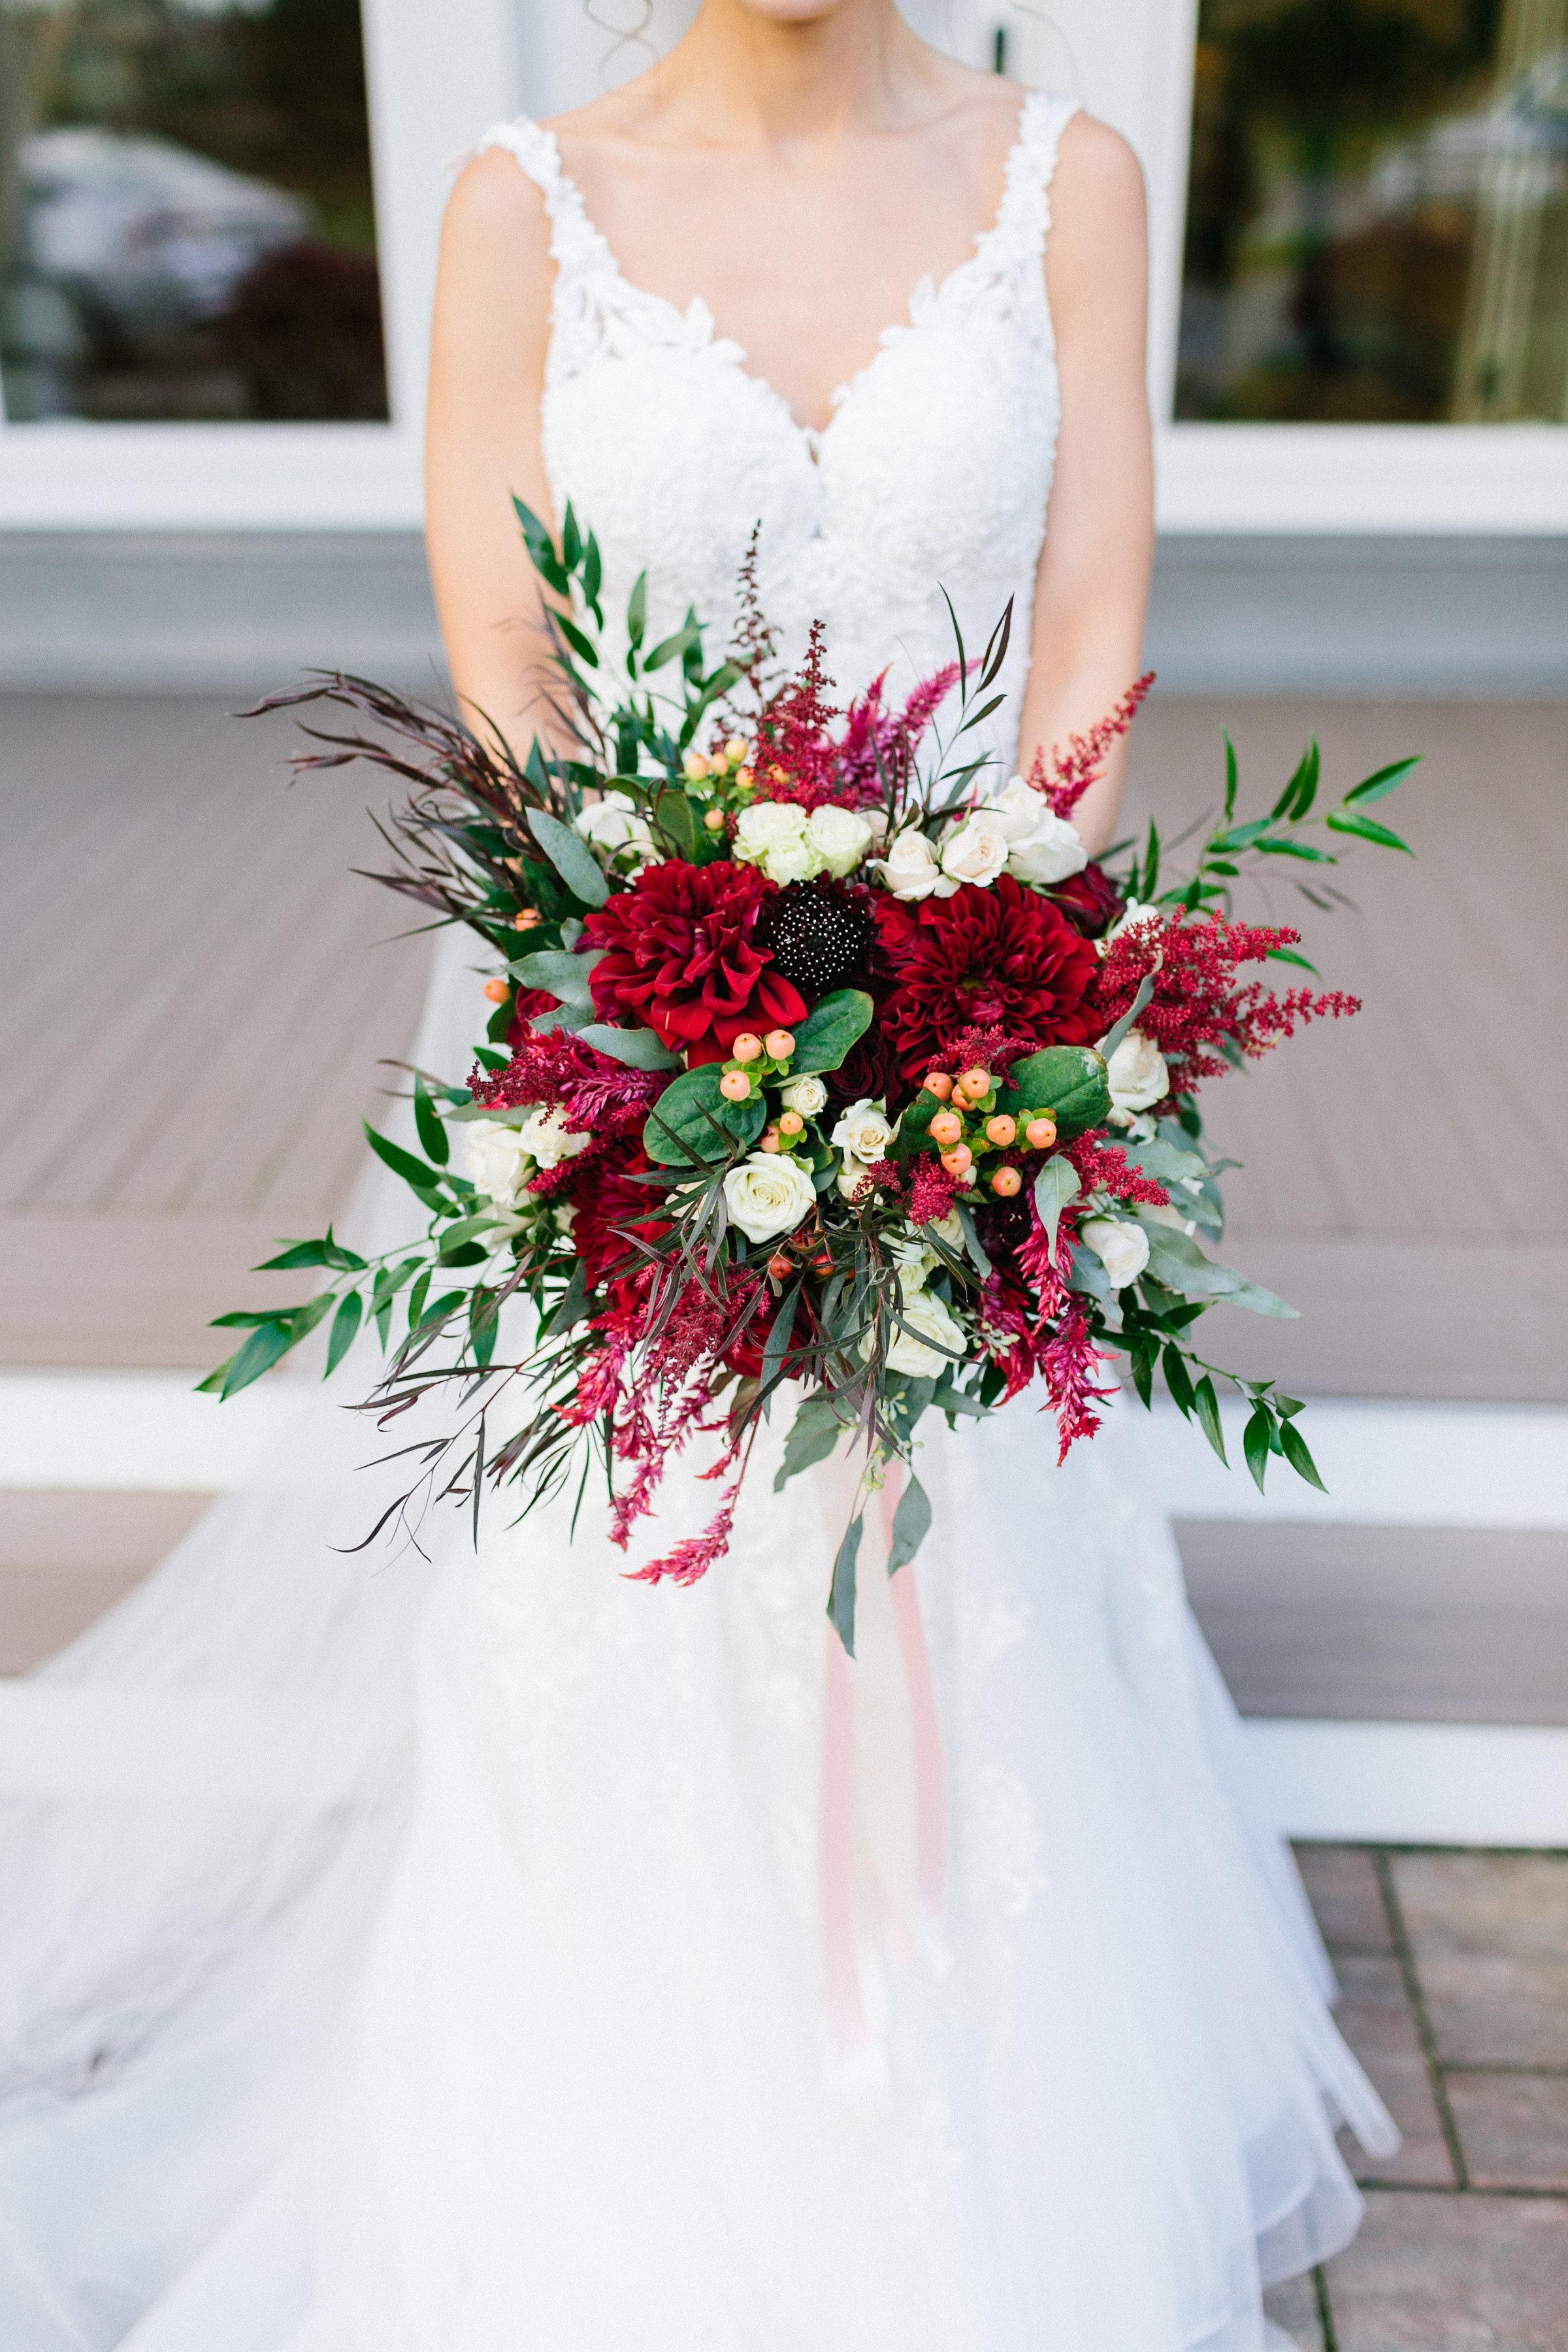 2017_Carly_Milbrath_Jefferson_Street_Inn_Wedding_Wausau_WI_240.JPG